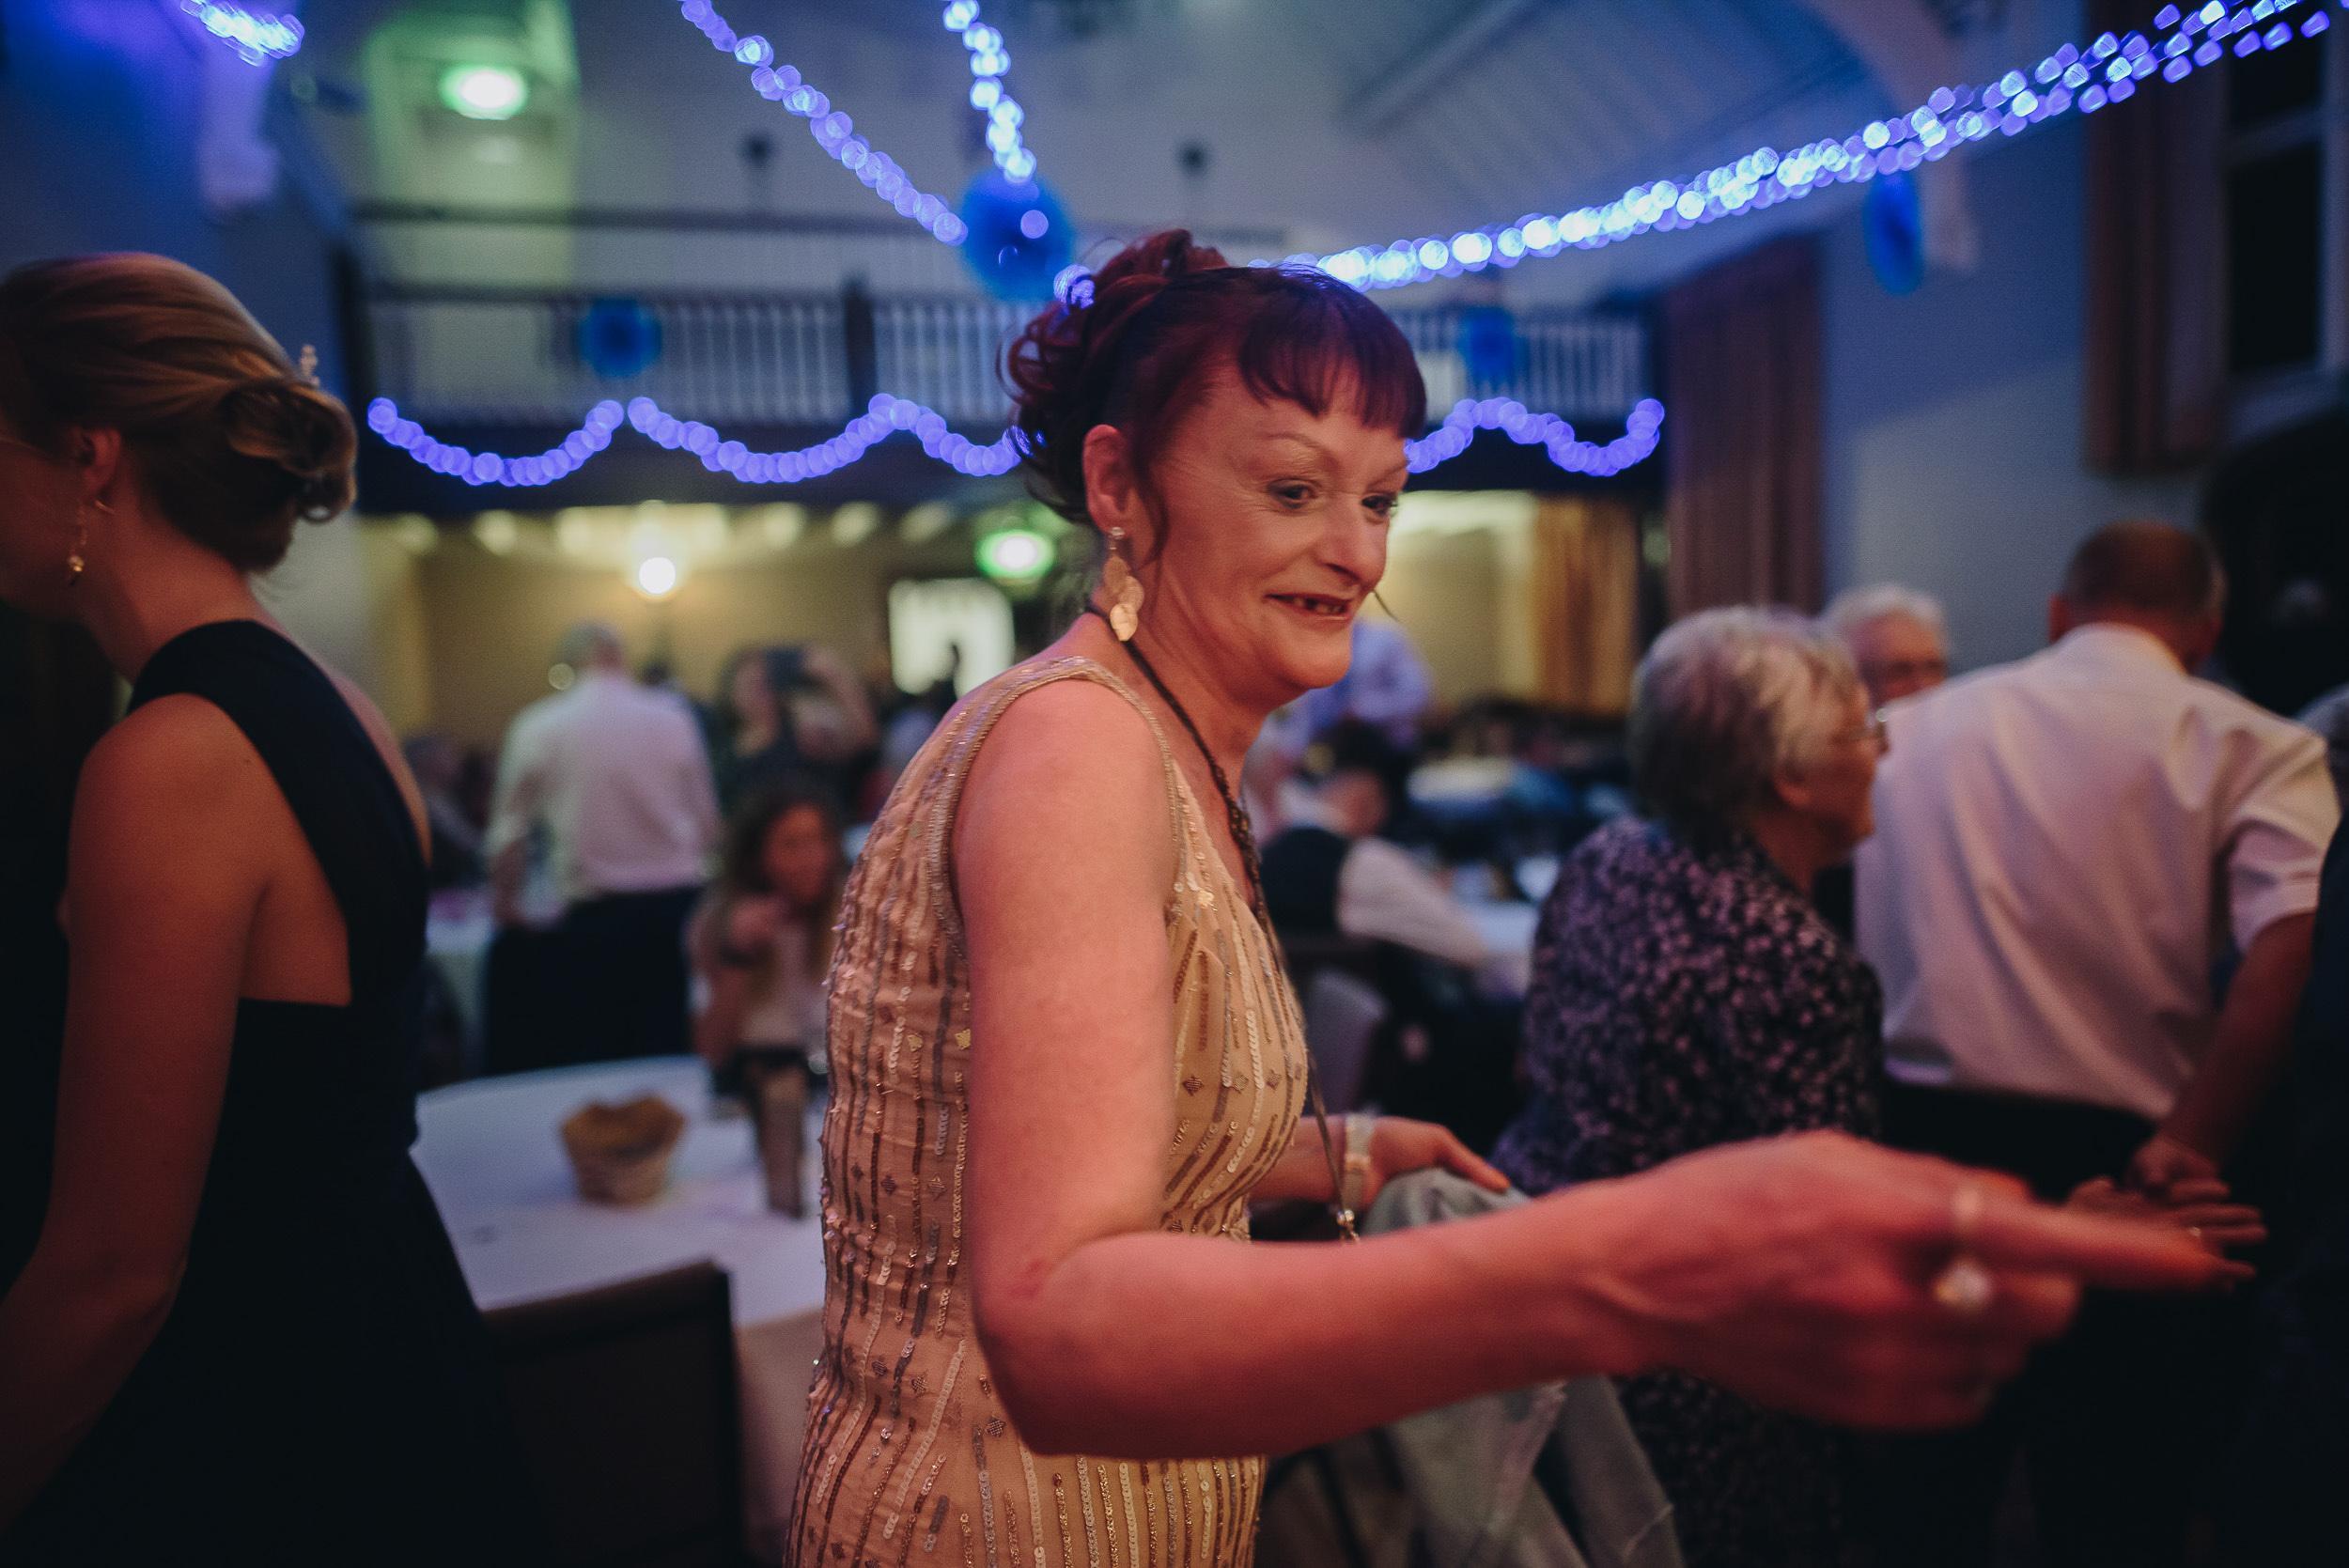 Smithills-hall-wedding-manchester-the-barlow-edgworth-hadfield-129.jpg